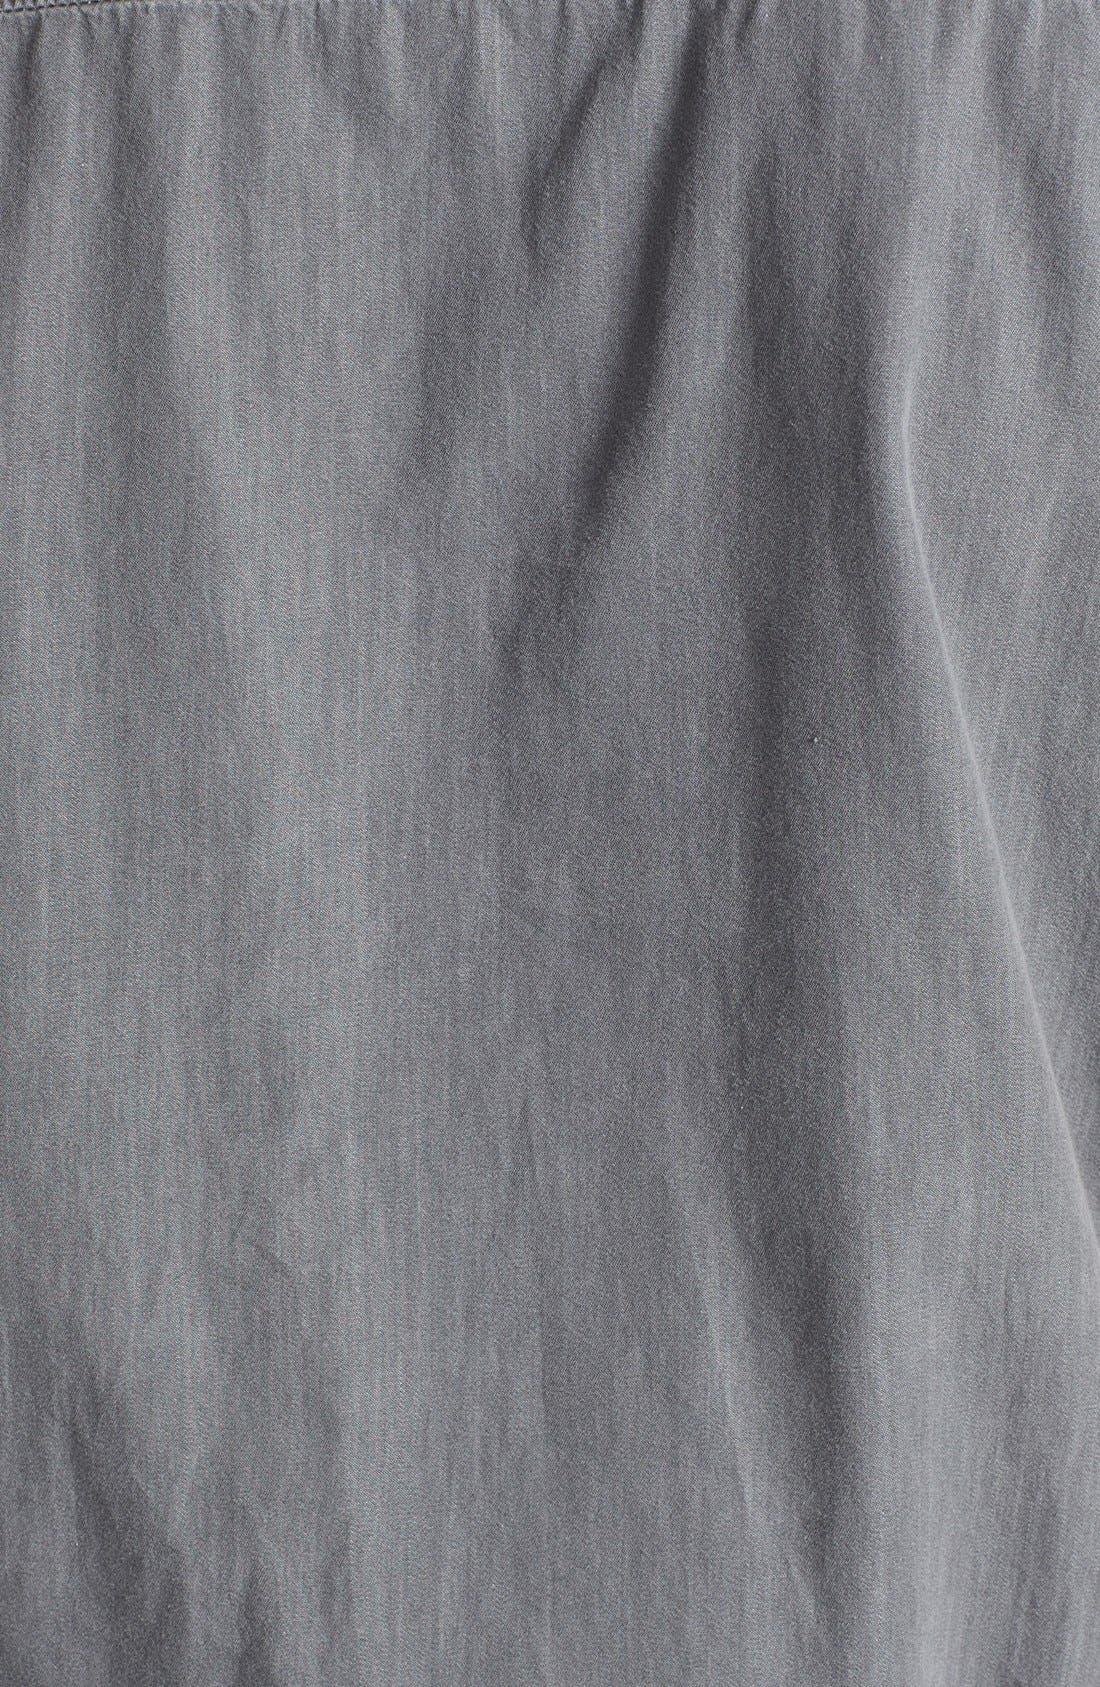 Alternate Image 3  - Paige Denim 'Mila' Shirtdress